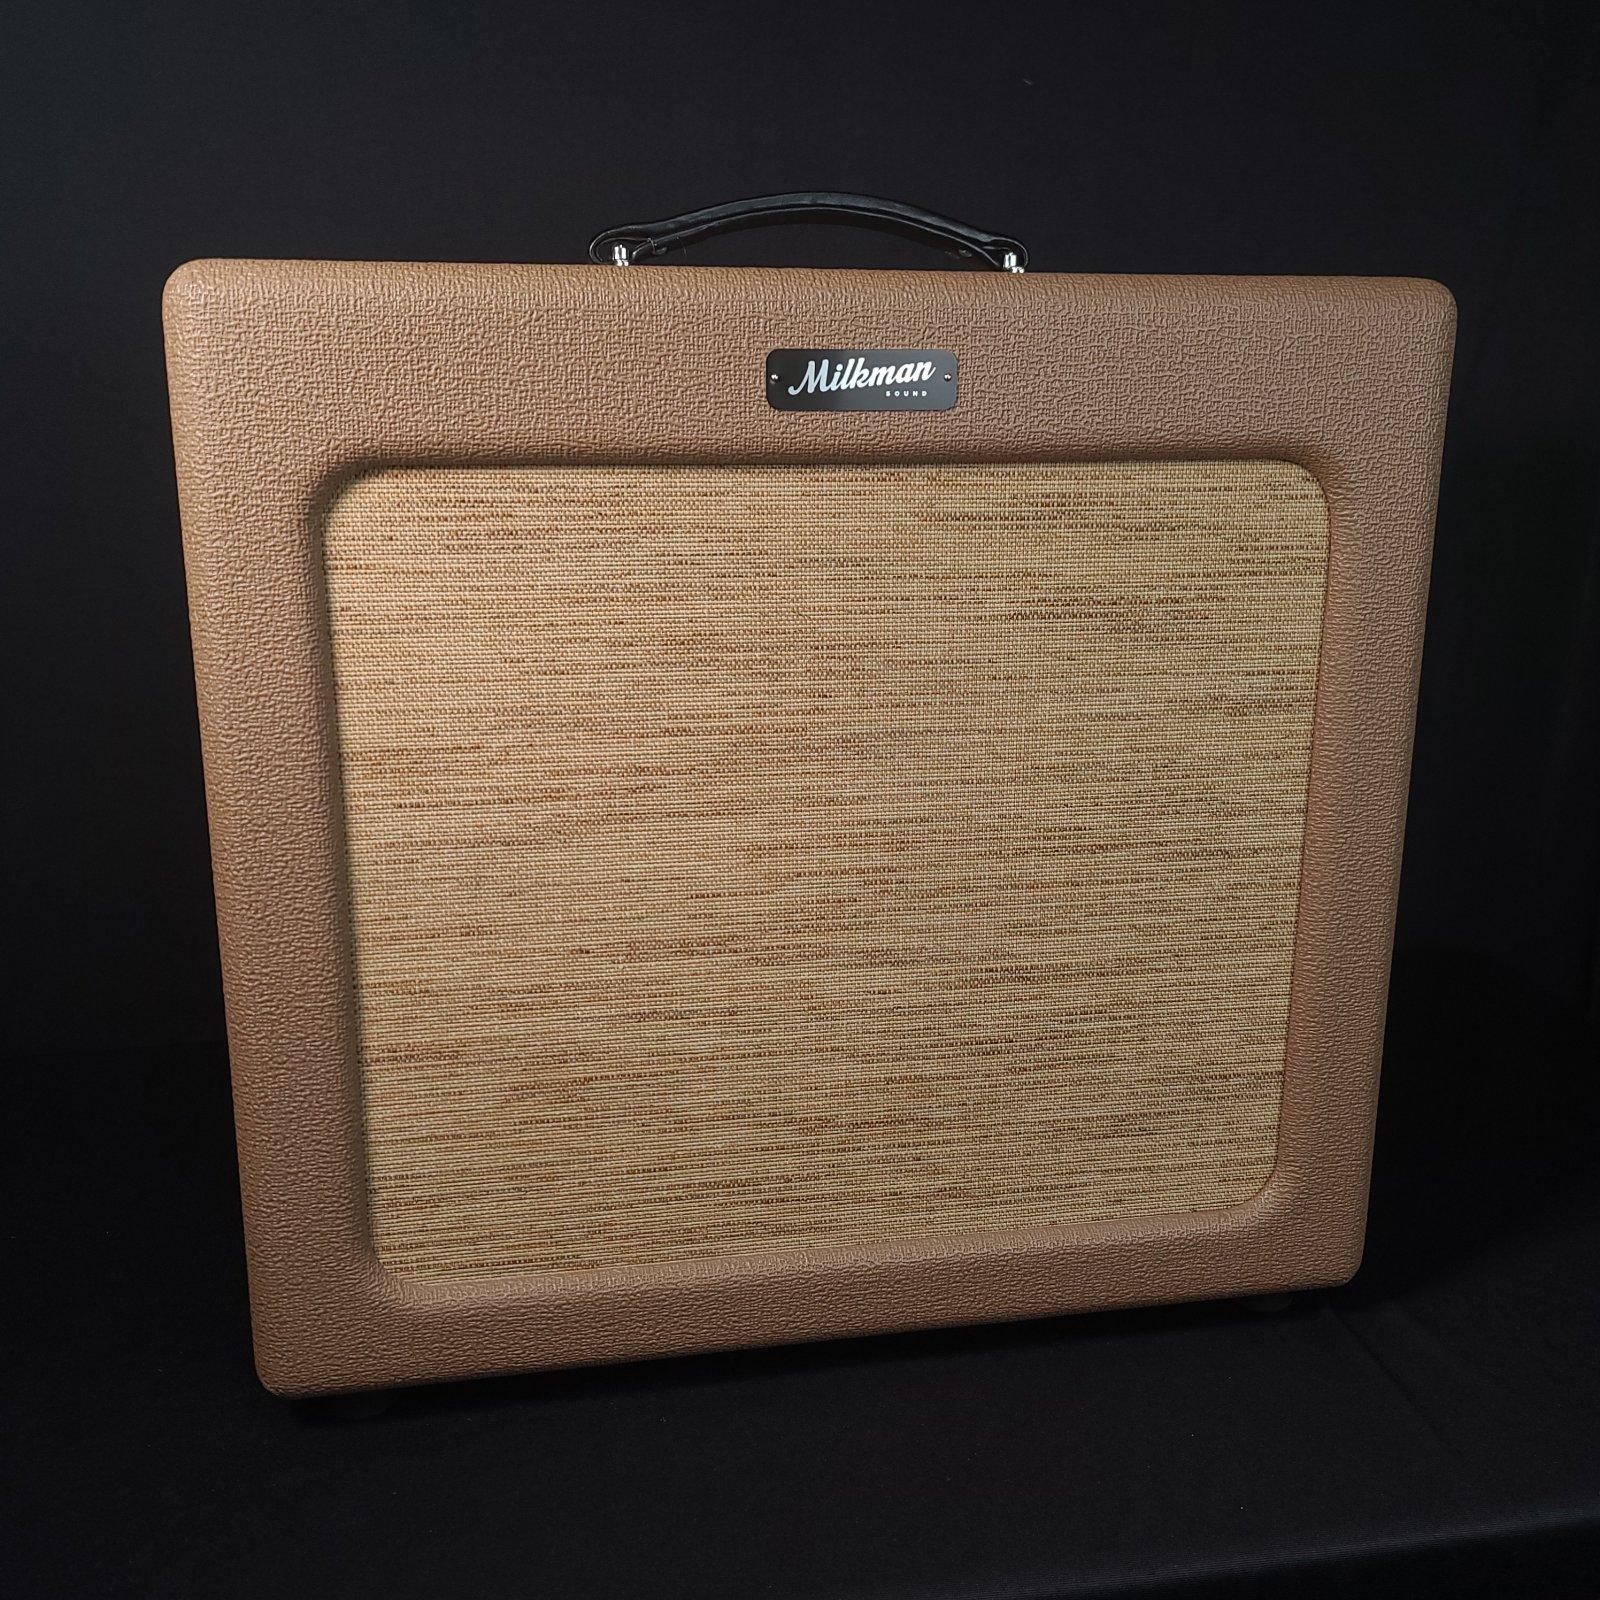 USED Milkman TV 40 Watt Jupiter Speaker Amplifier w/Cover